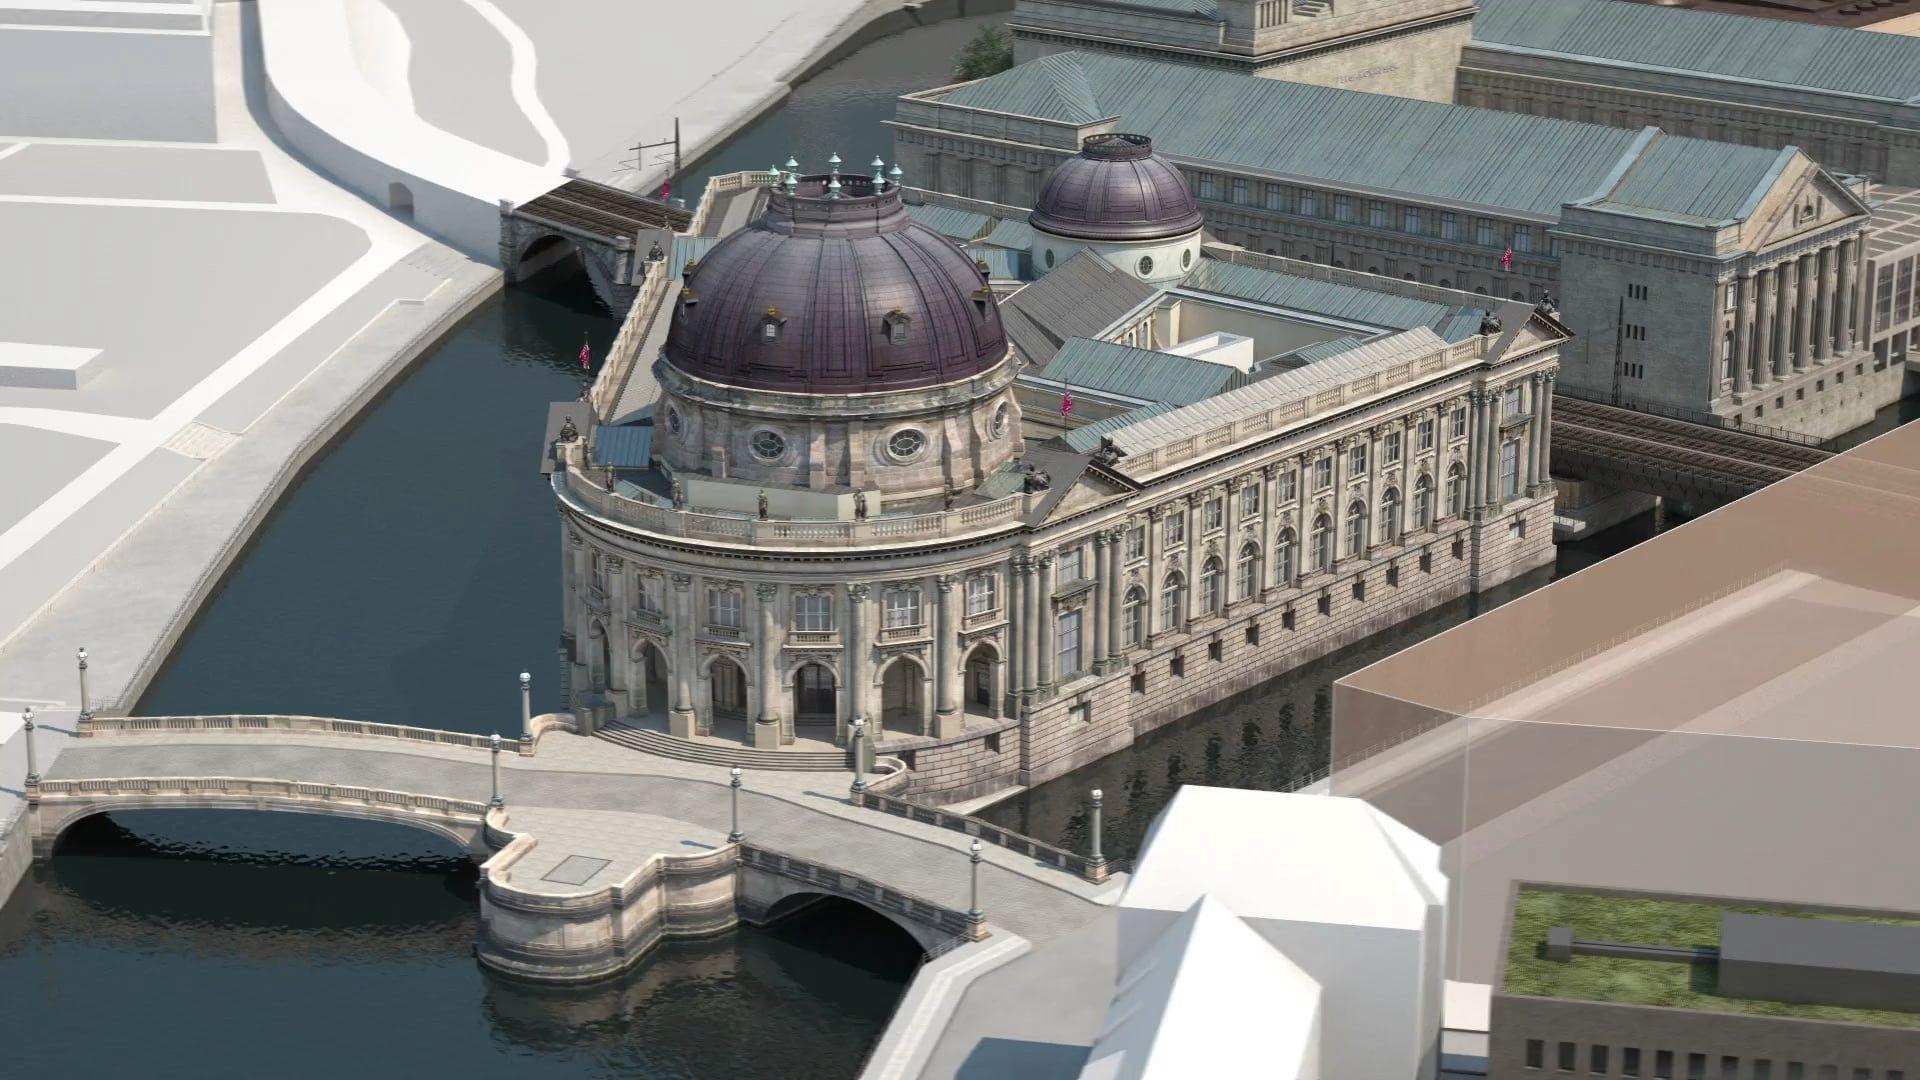 Bode Museum Masterplan Museumsinsel Projektion Zukunft Statue Of Liberty Museum Landmarks